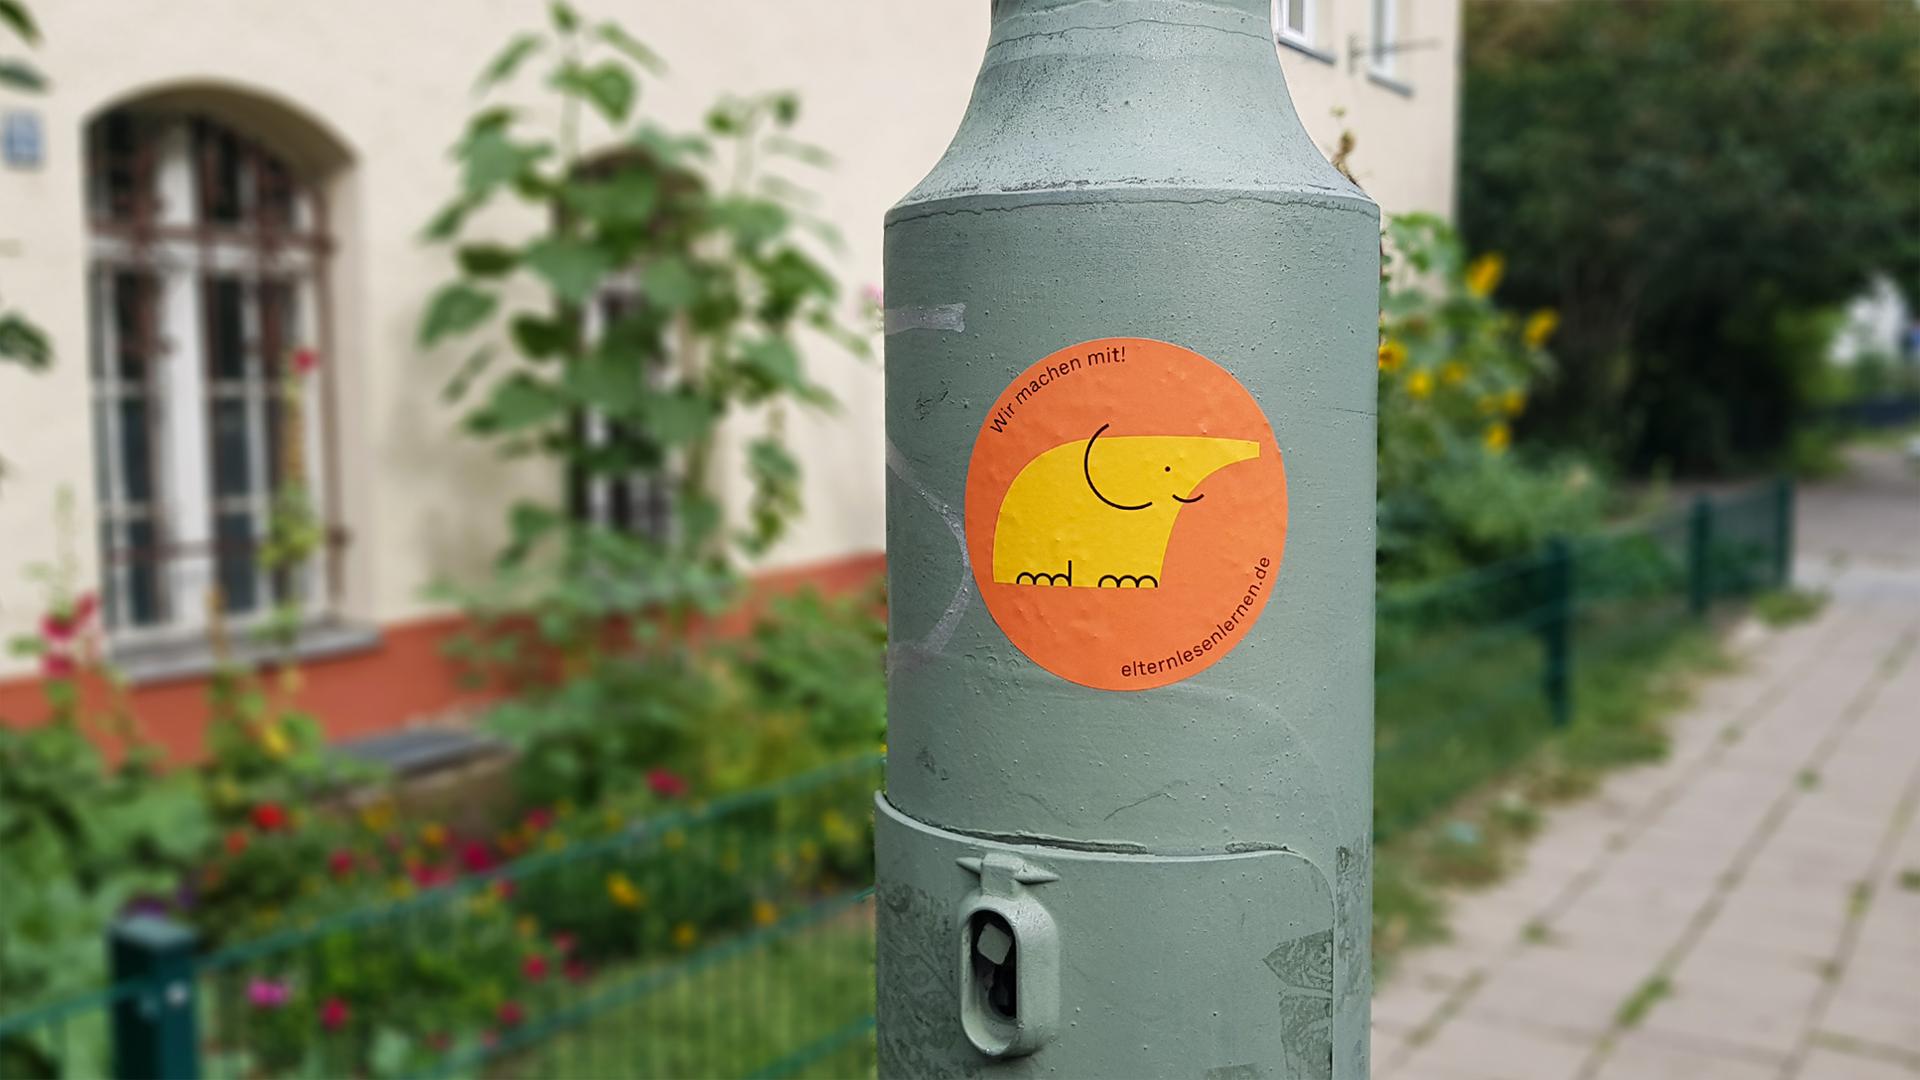 elternlesenlernen_gallery-4